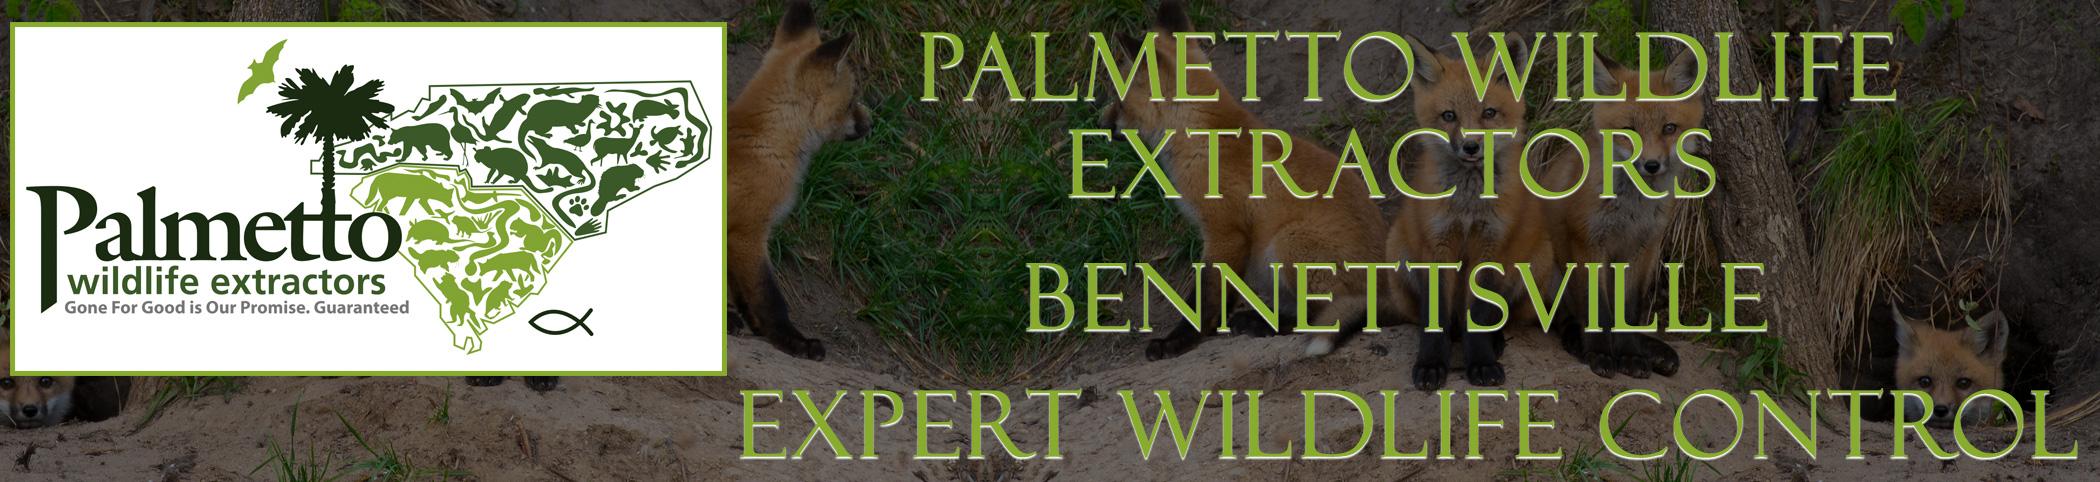 Palmetto Wildlife Extractors Bennettsville south carolina header image